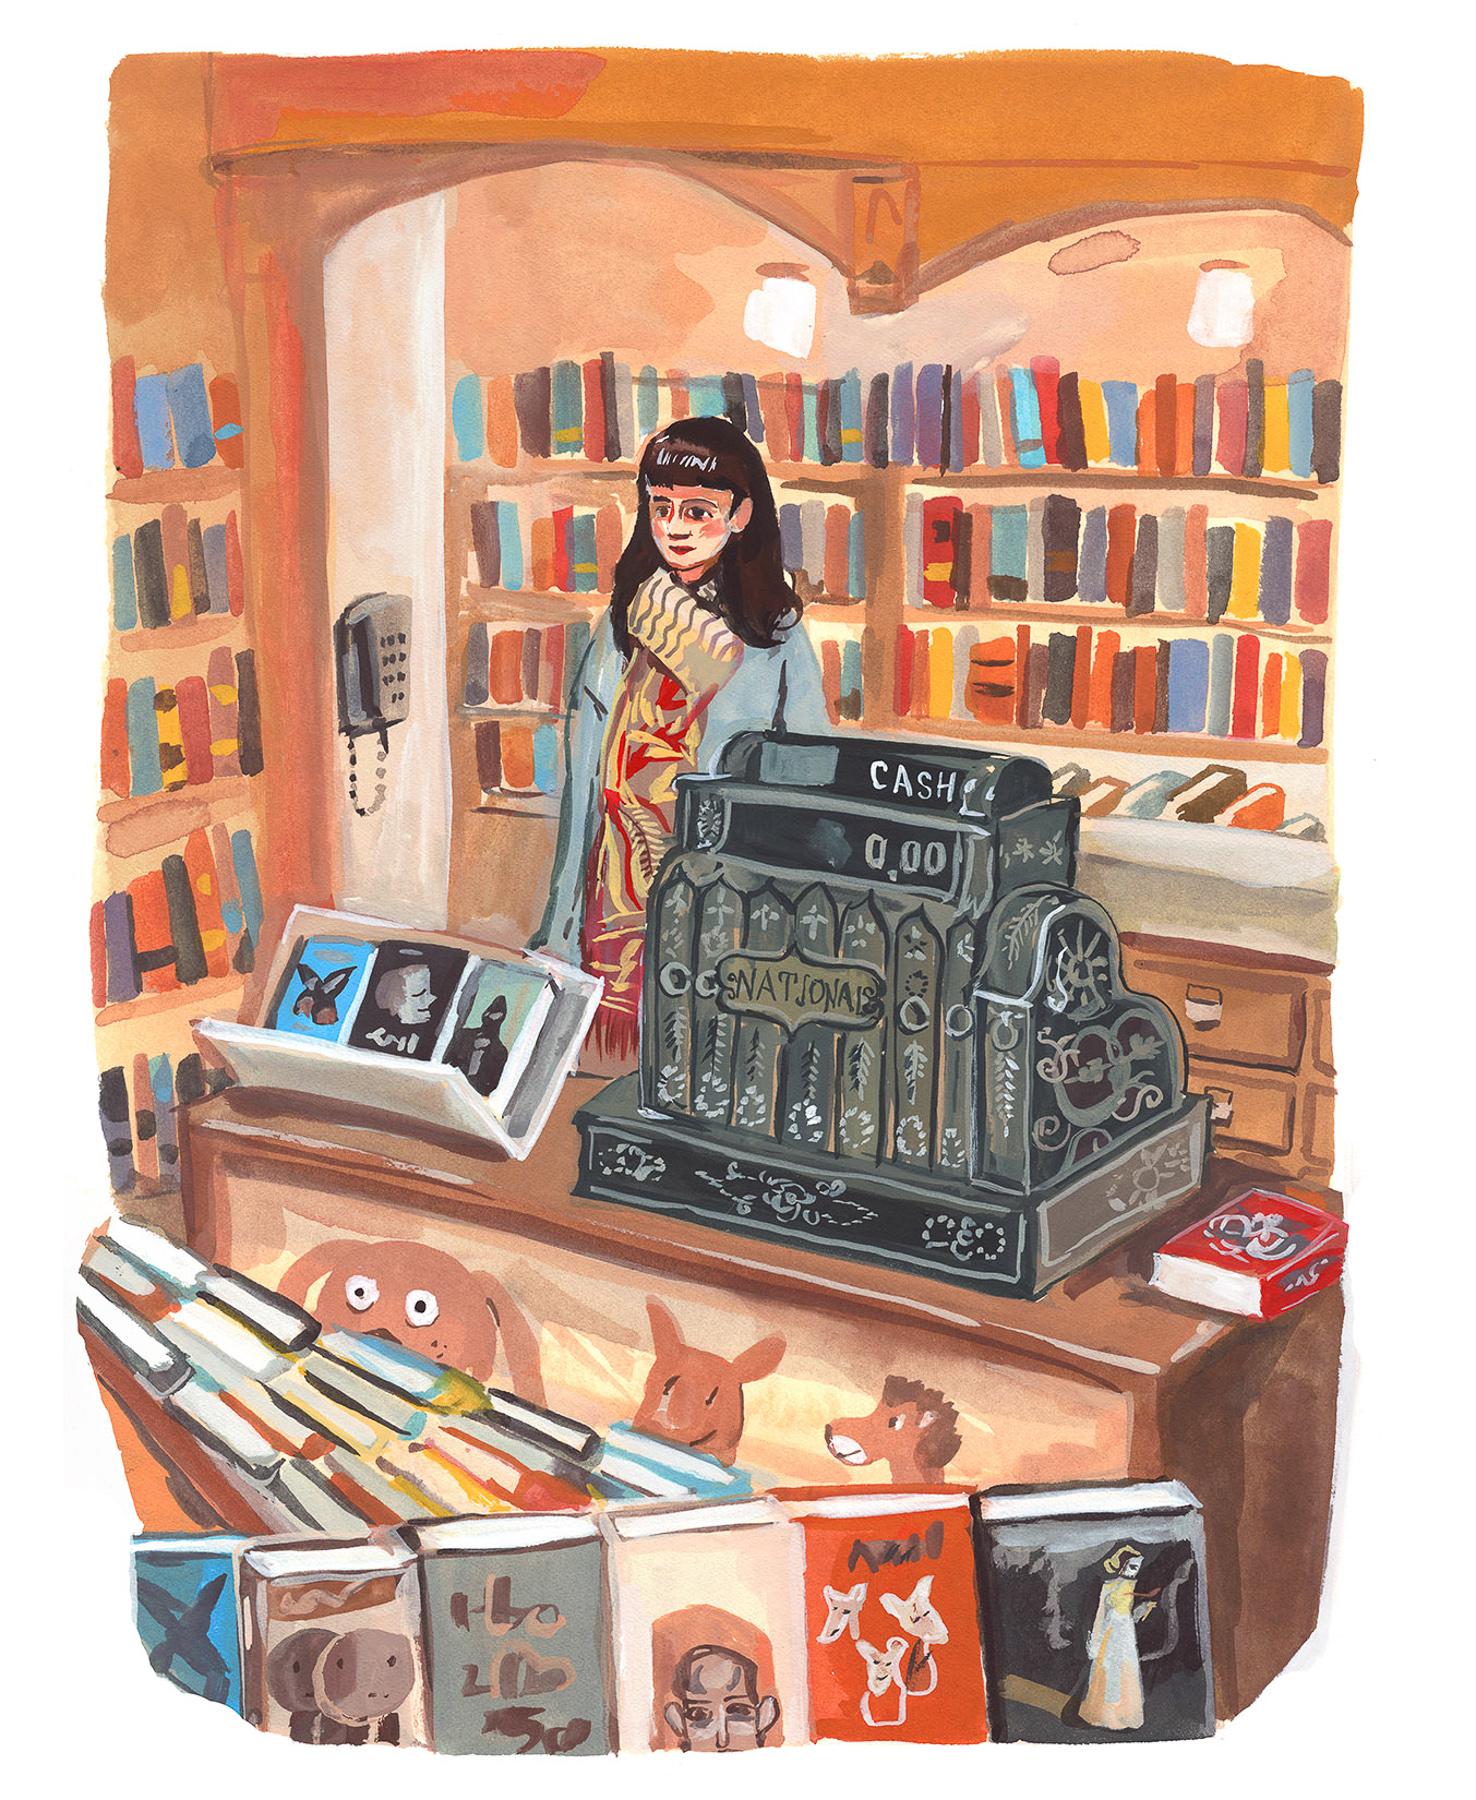 CA 60 2019, SOI 61 2018 - ARTIST: Jenny KroikTITLE: Corner Bookstore [2 of 7]